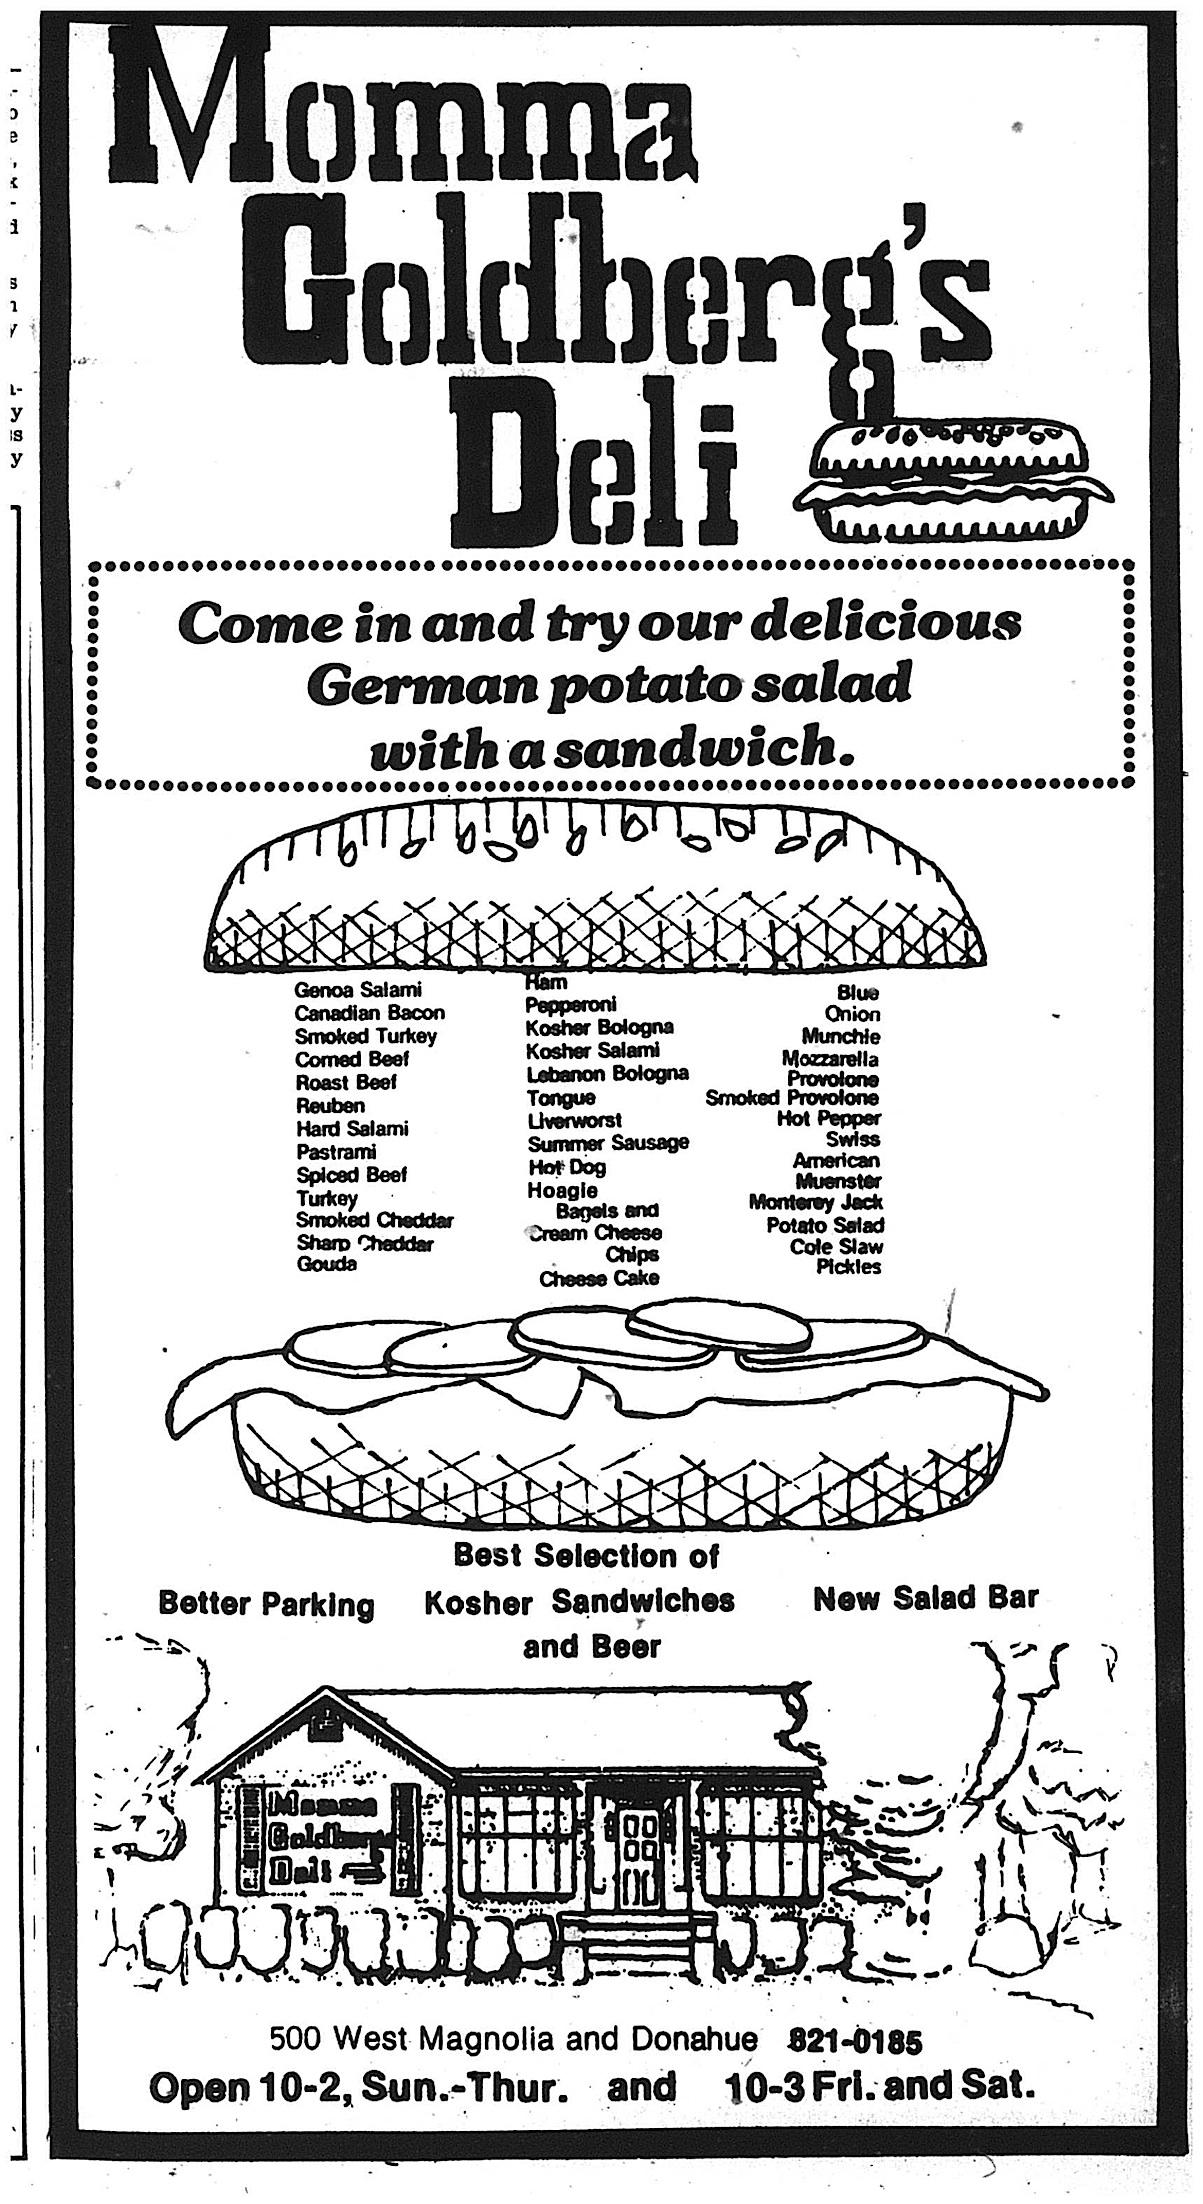 momma goldberg's 1979 menu crop